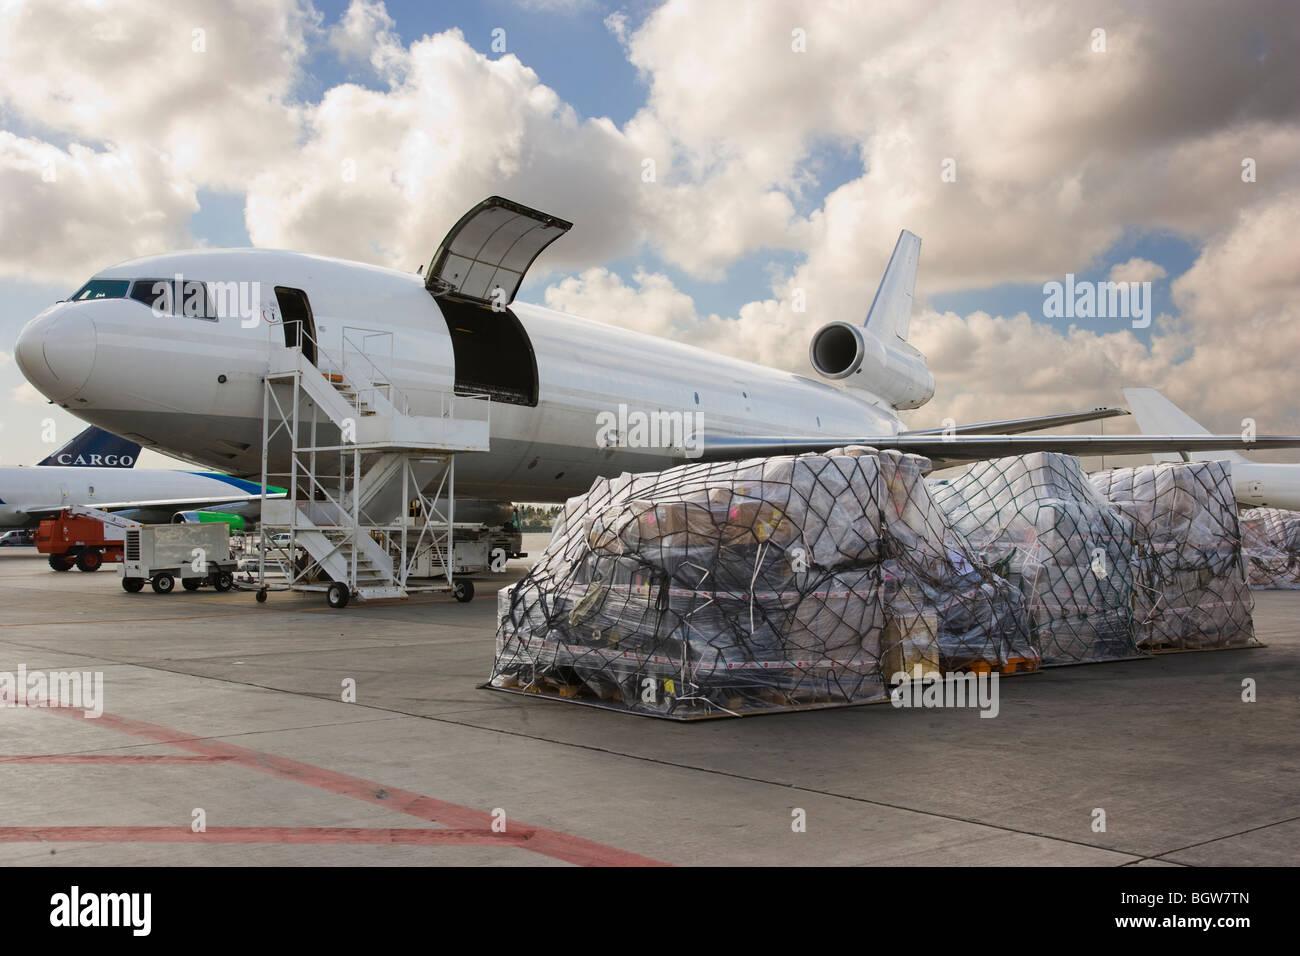 Cargo Plane Stock Photos & Cargo Plane Stock Images - Alamy